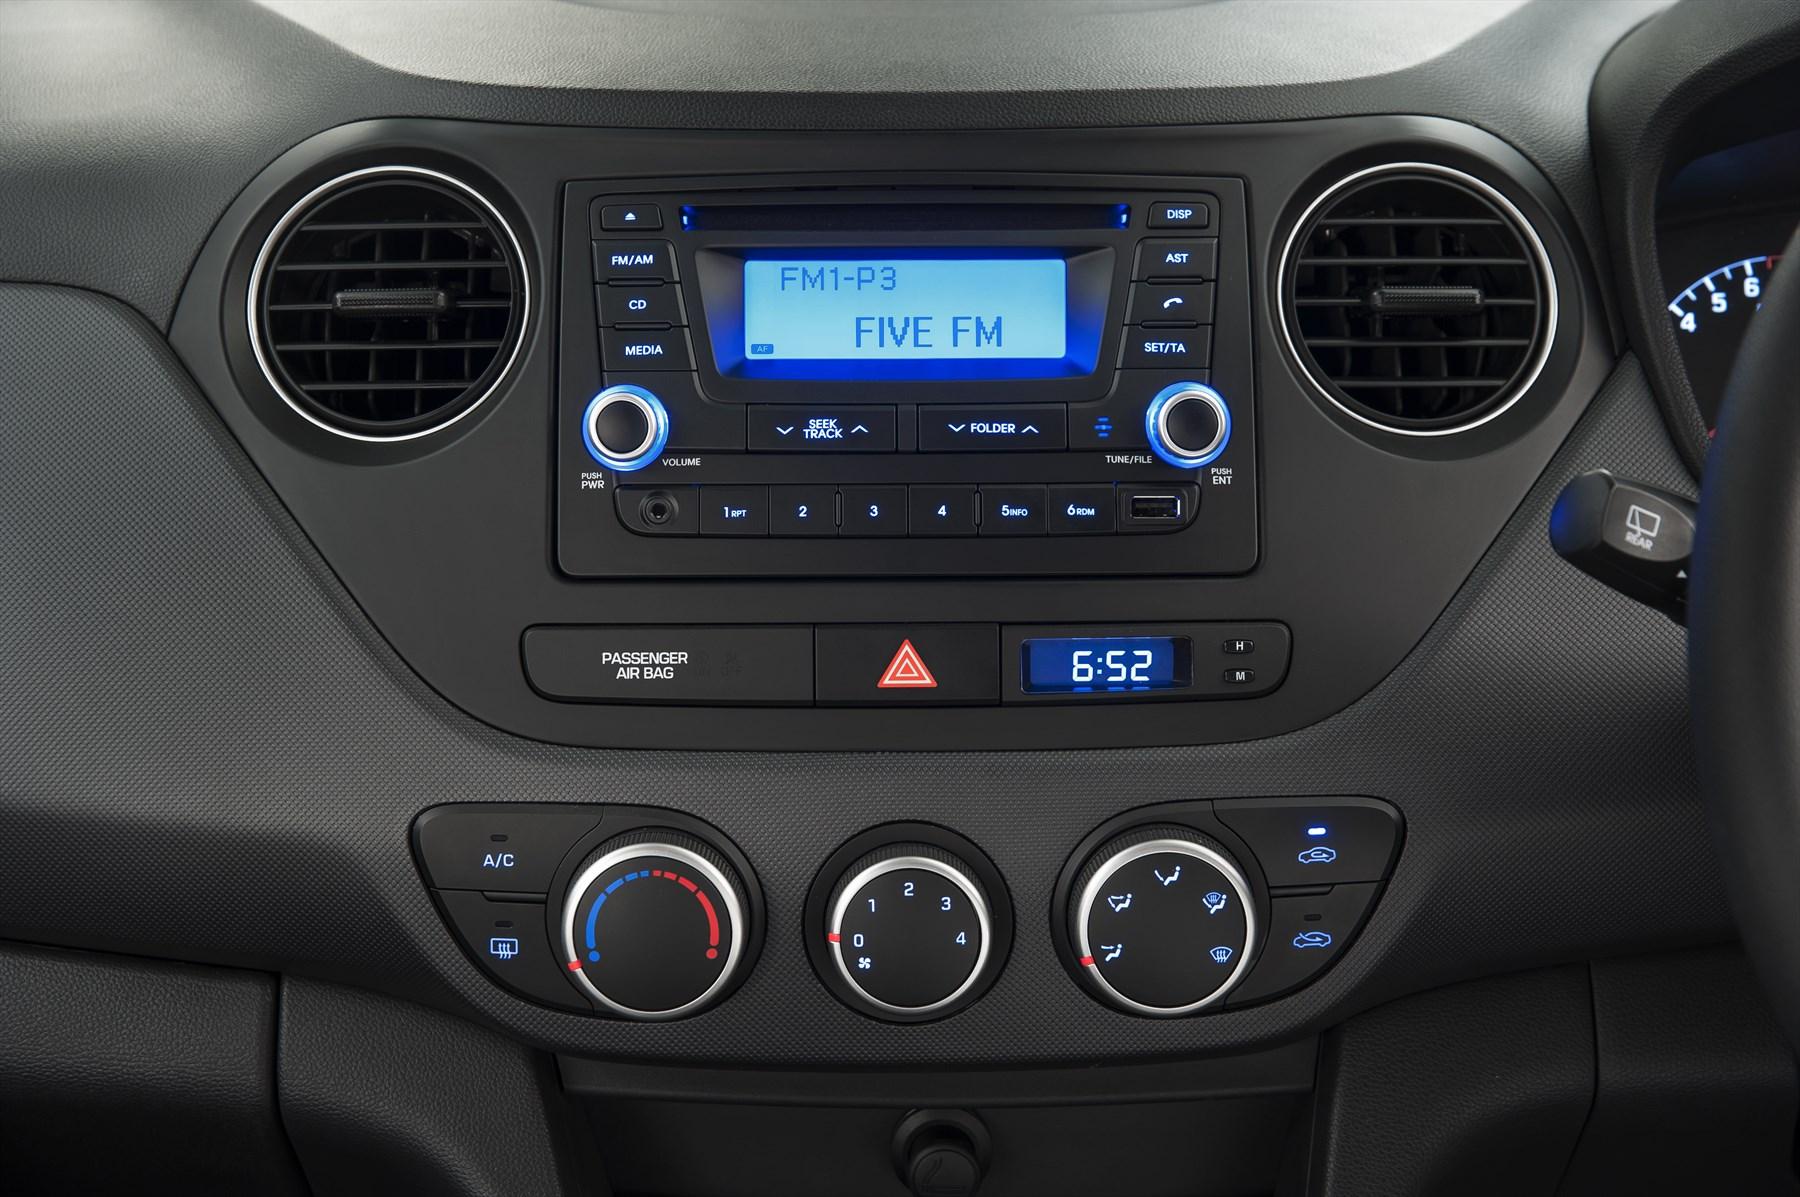 Hyundai I10 Makes Grand Entrance Latest News Surf4cars Co Za Motoring News